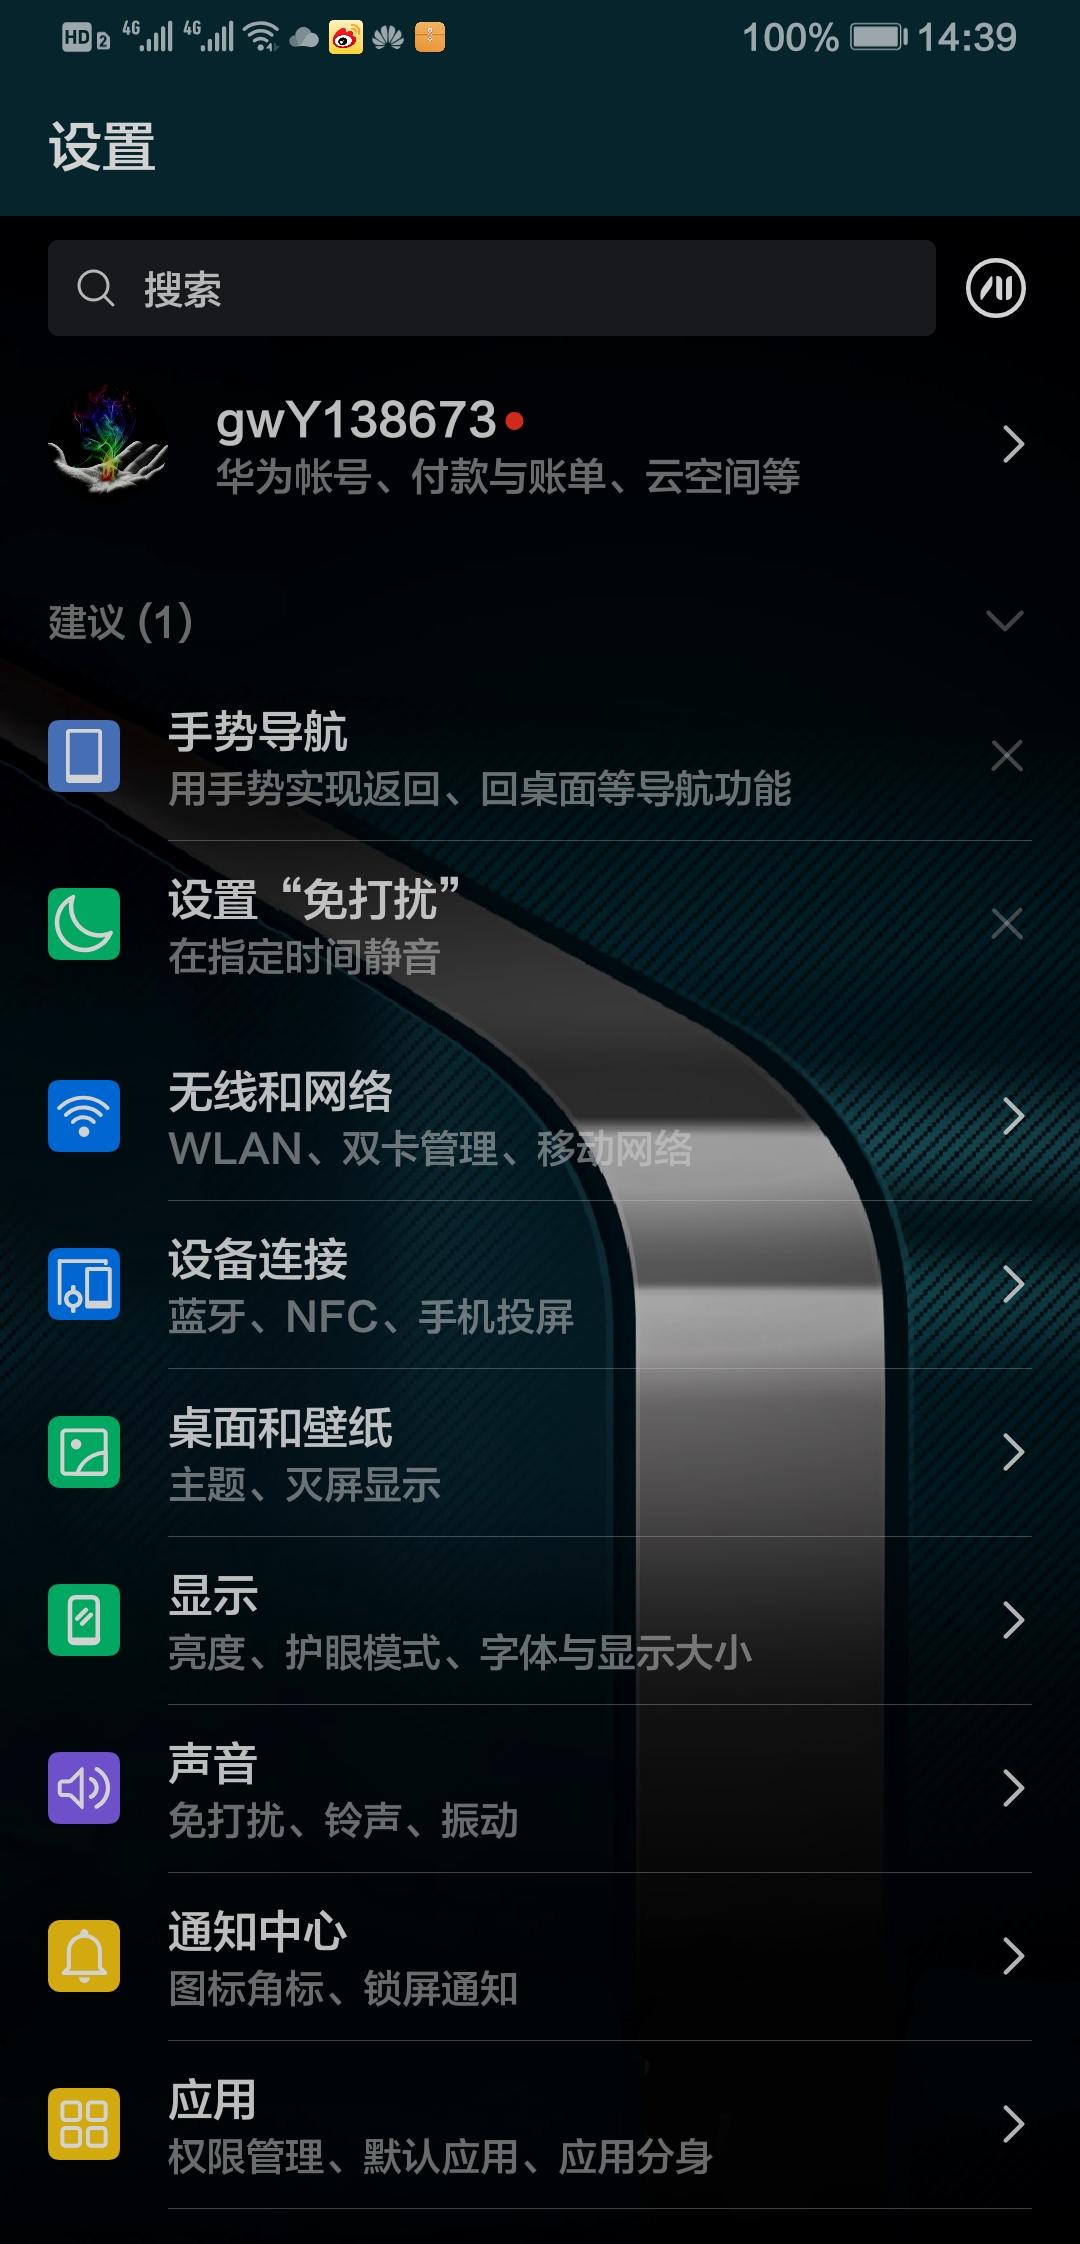 Screenshot_20190623_143950_com.android.settings.jpg